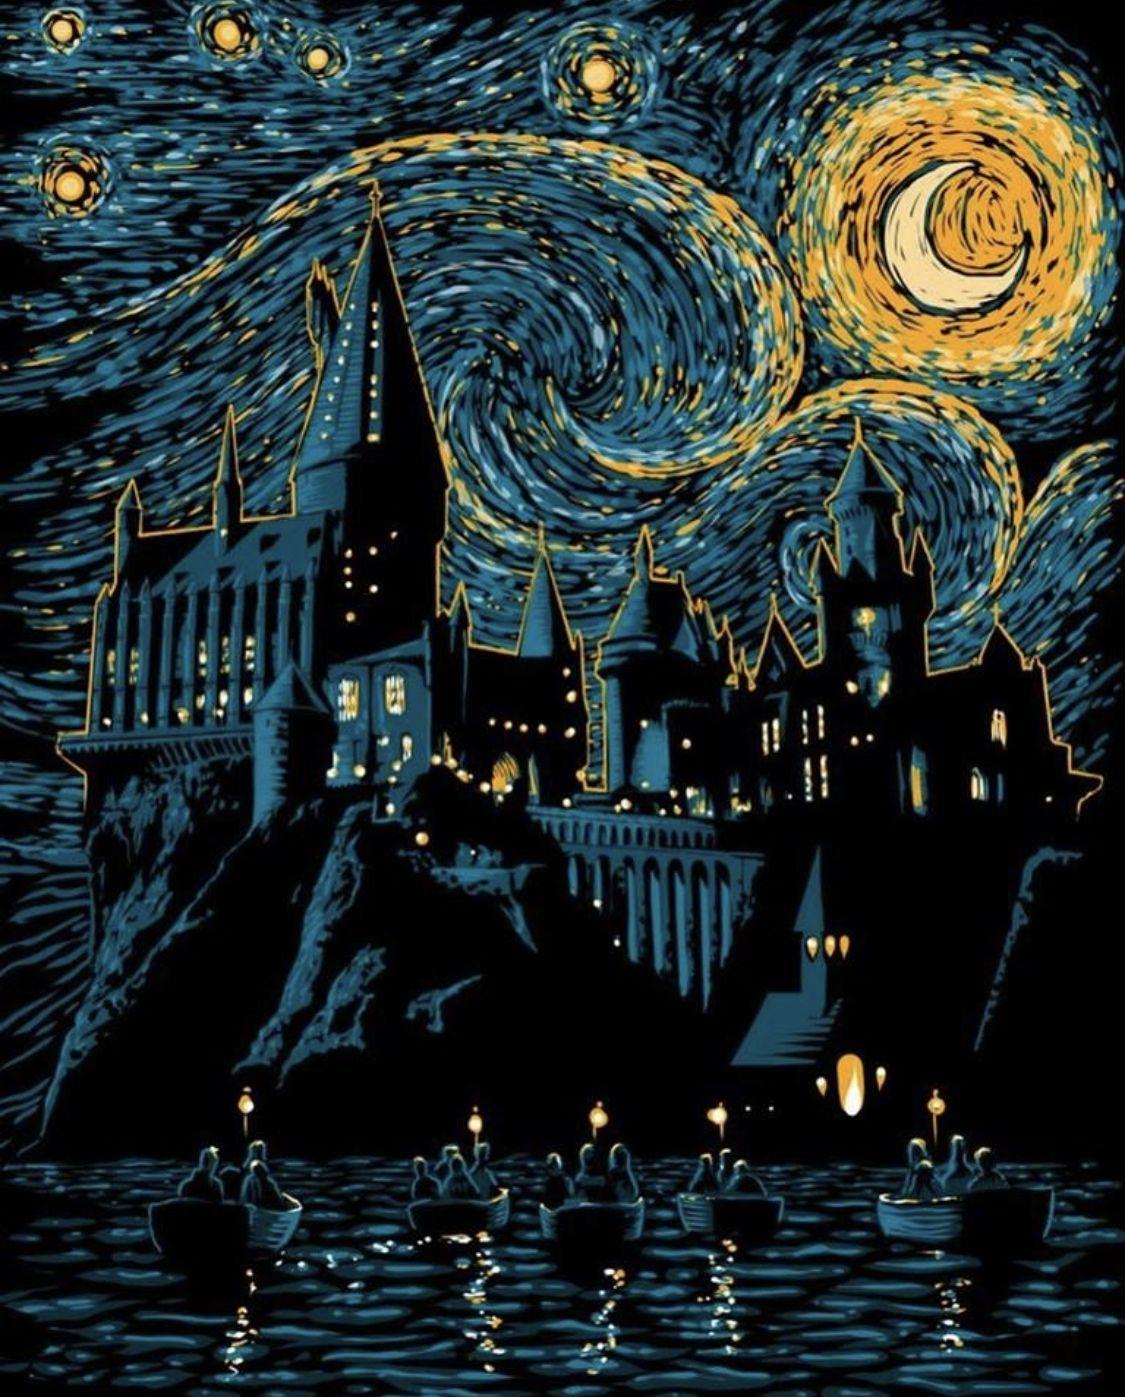 Noche Estrellada En Hogwarts Arte De Harry Potter Harry Potter Fondos De Pantalla Pinturas